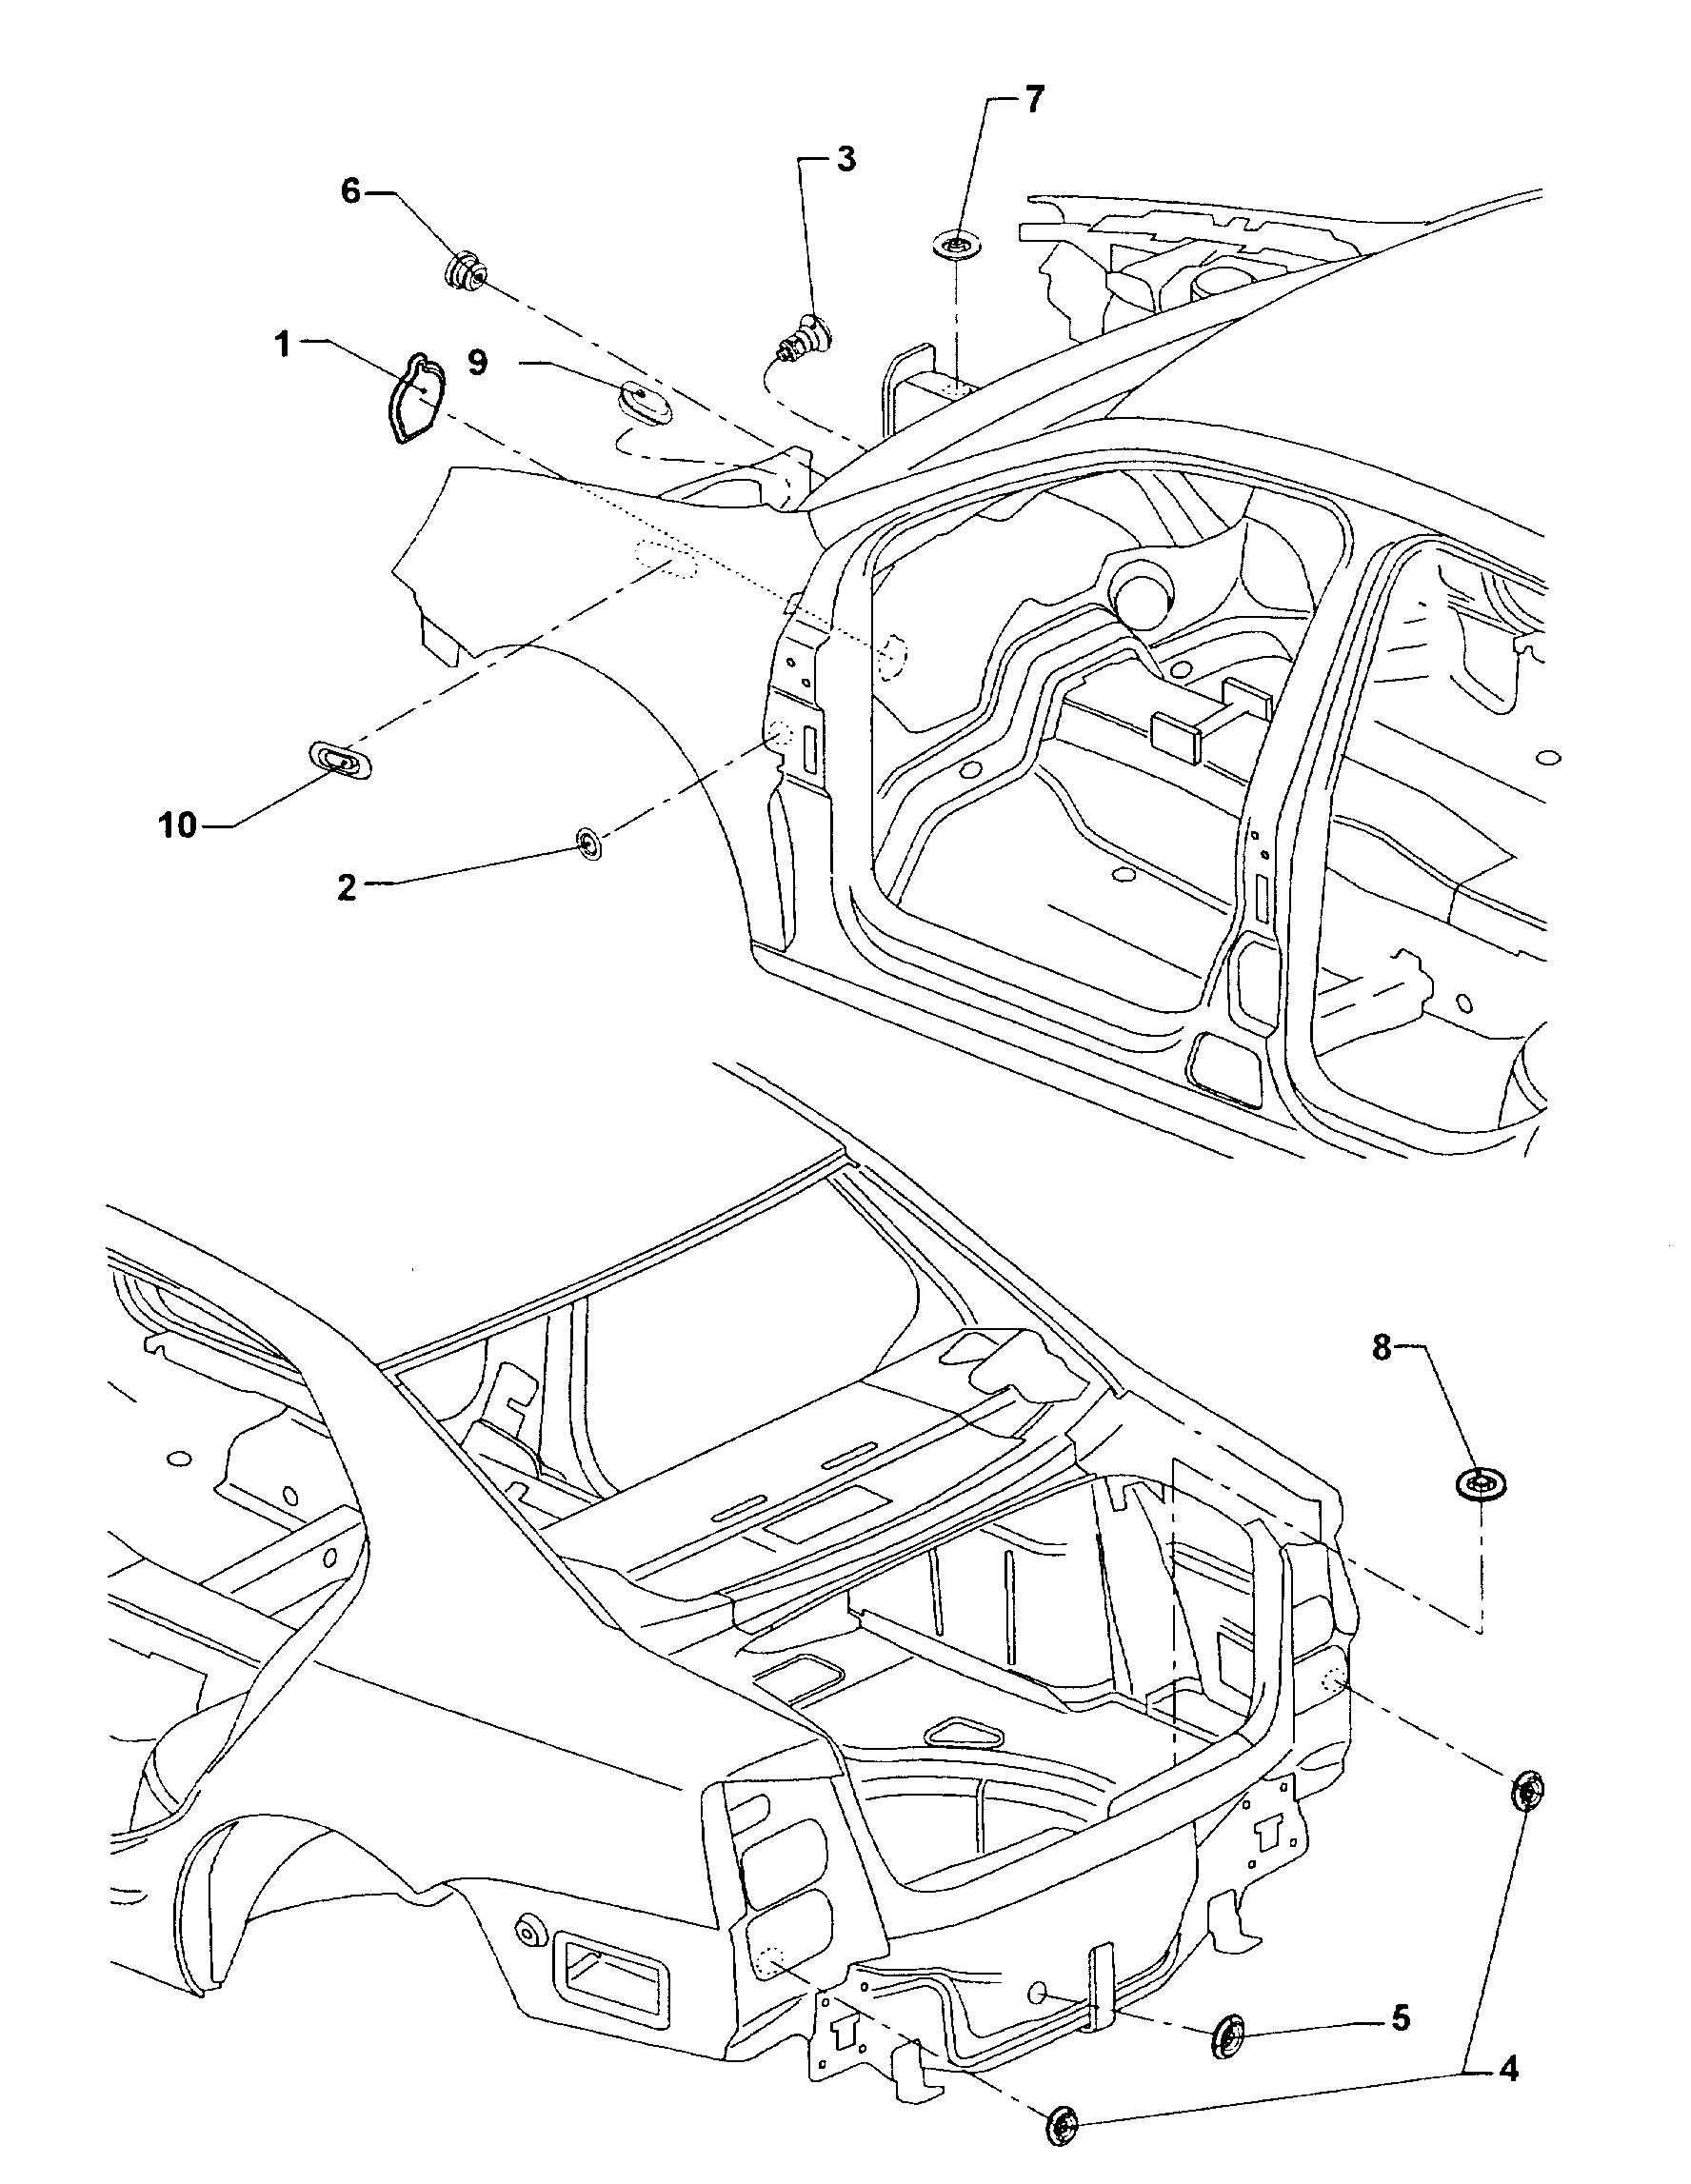 2001 Volkswagen Jetta Body Diagram Real Wiring 1999 Beetle Engine Http Wwwjimellisvwpartscom Vw Parts Get Free Image About 2000